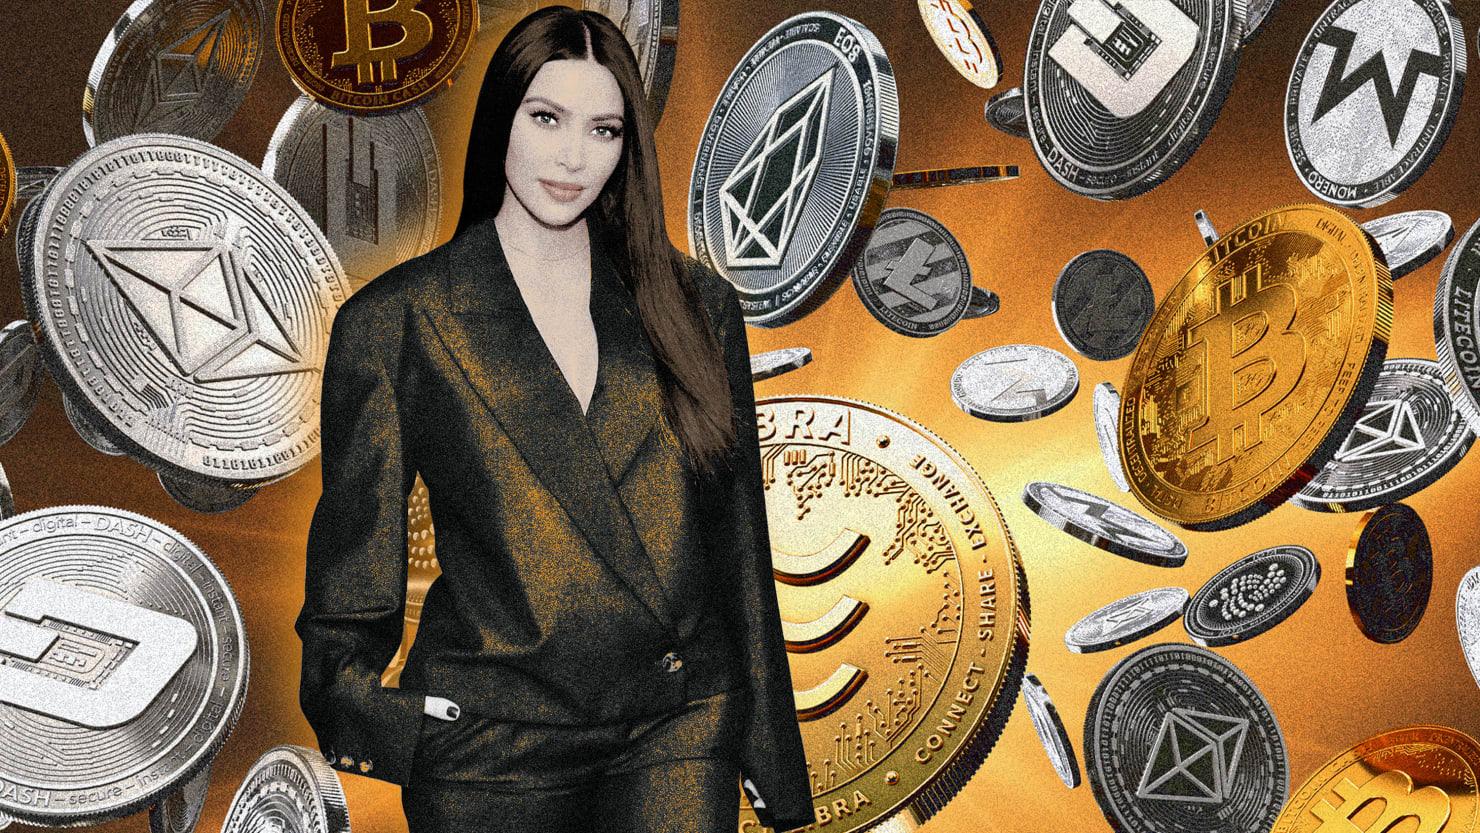 Why Is Kim Kardashian Hawking a Sketchy New Cryptocurrency?